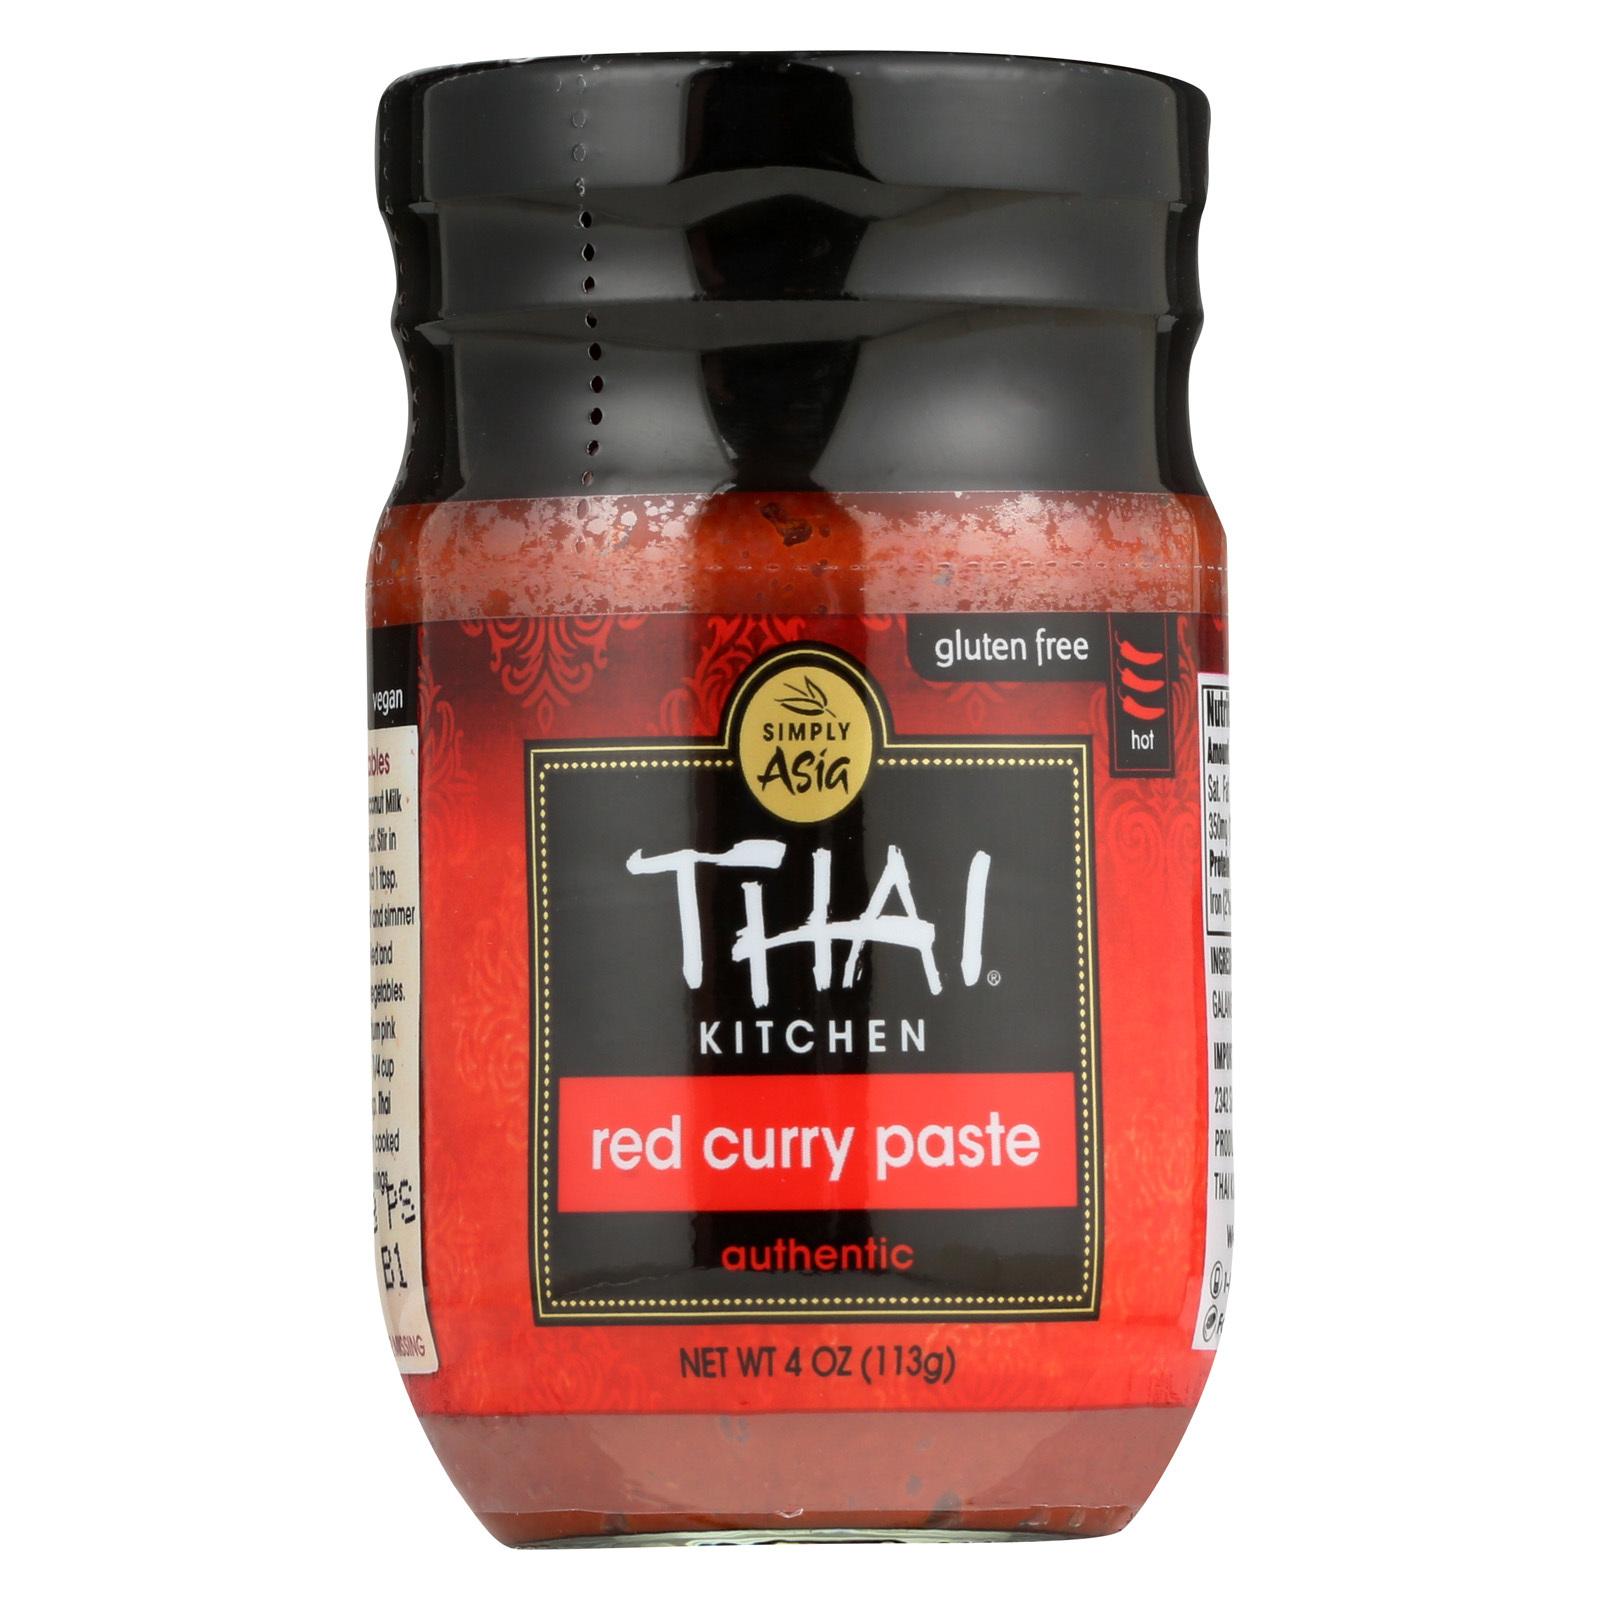 Thai Kitchen Red Curry Paste - 4 oz.